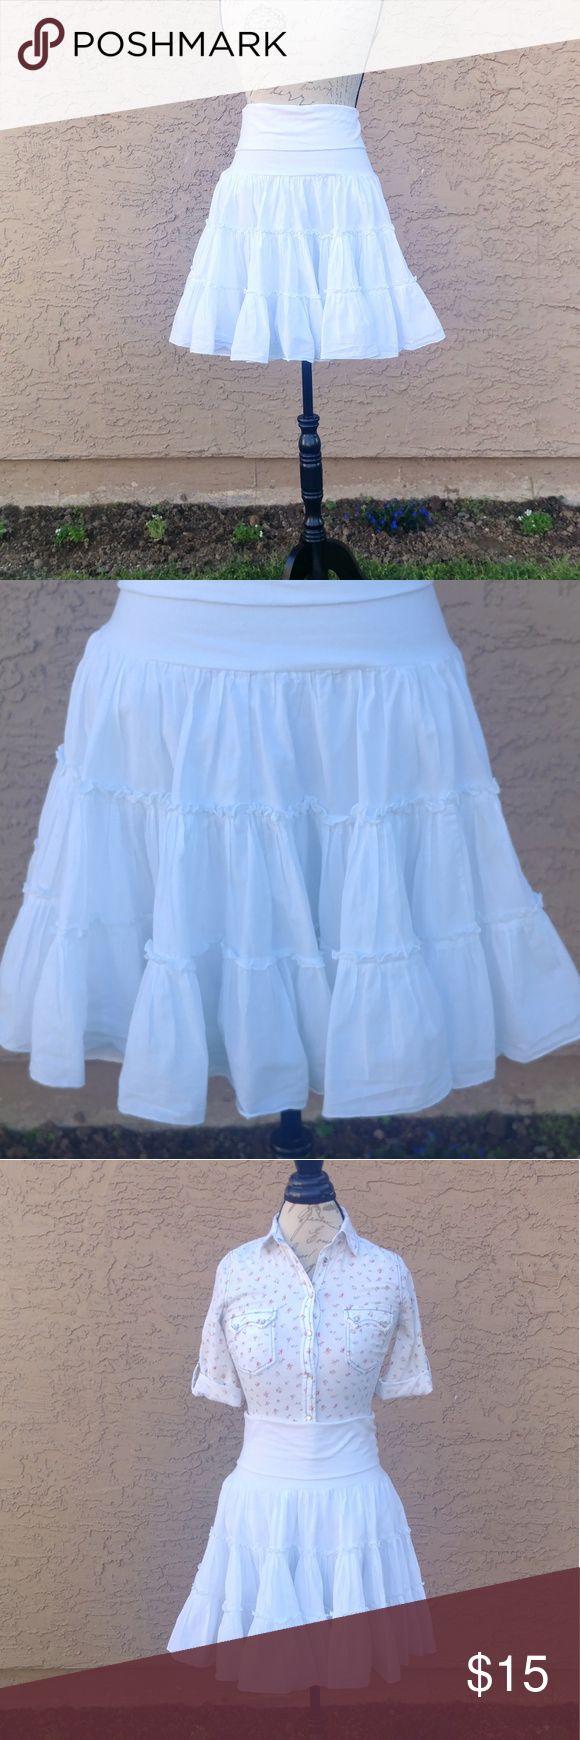 "Ruffled white mini skirt Very good condition. Worn only twice. Measures:  Waist flat 15""  Length 22.5"" Skirts Mini"